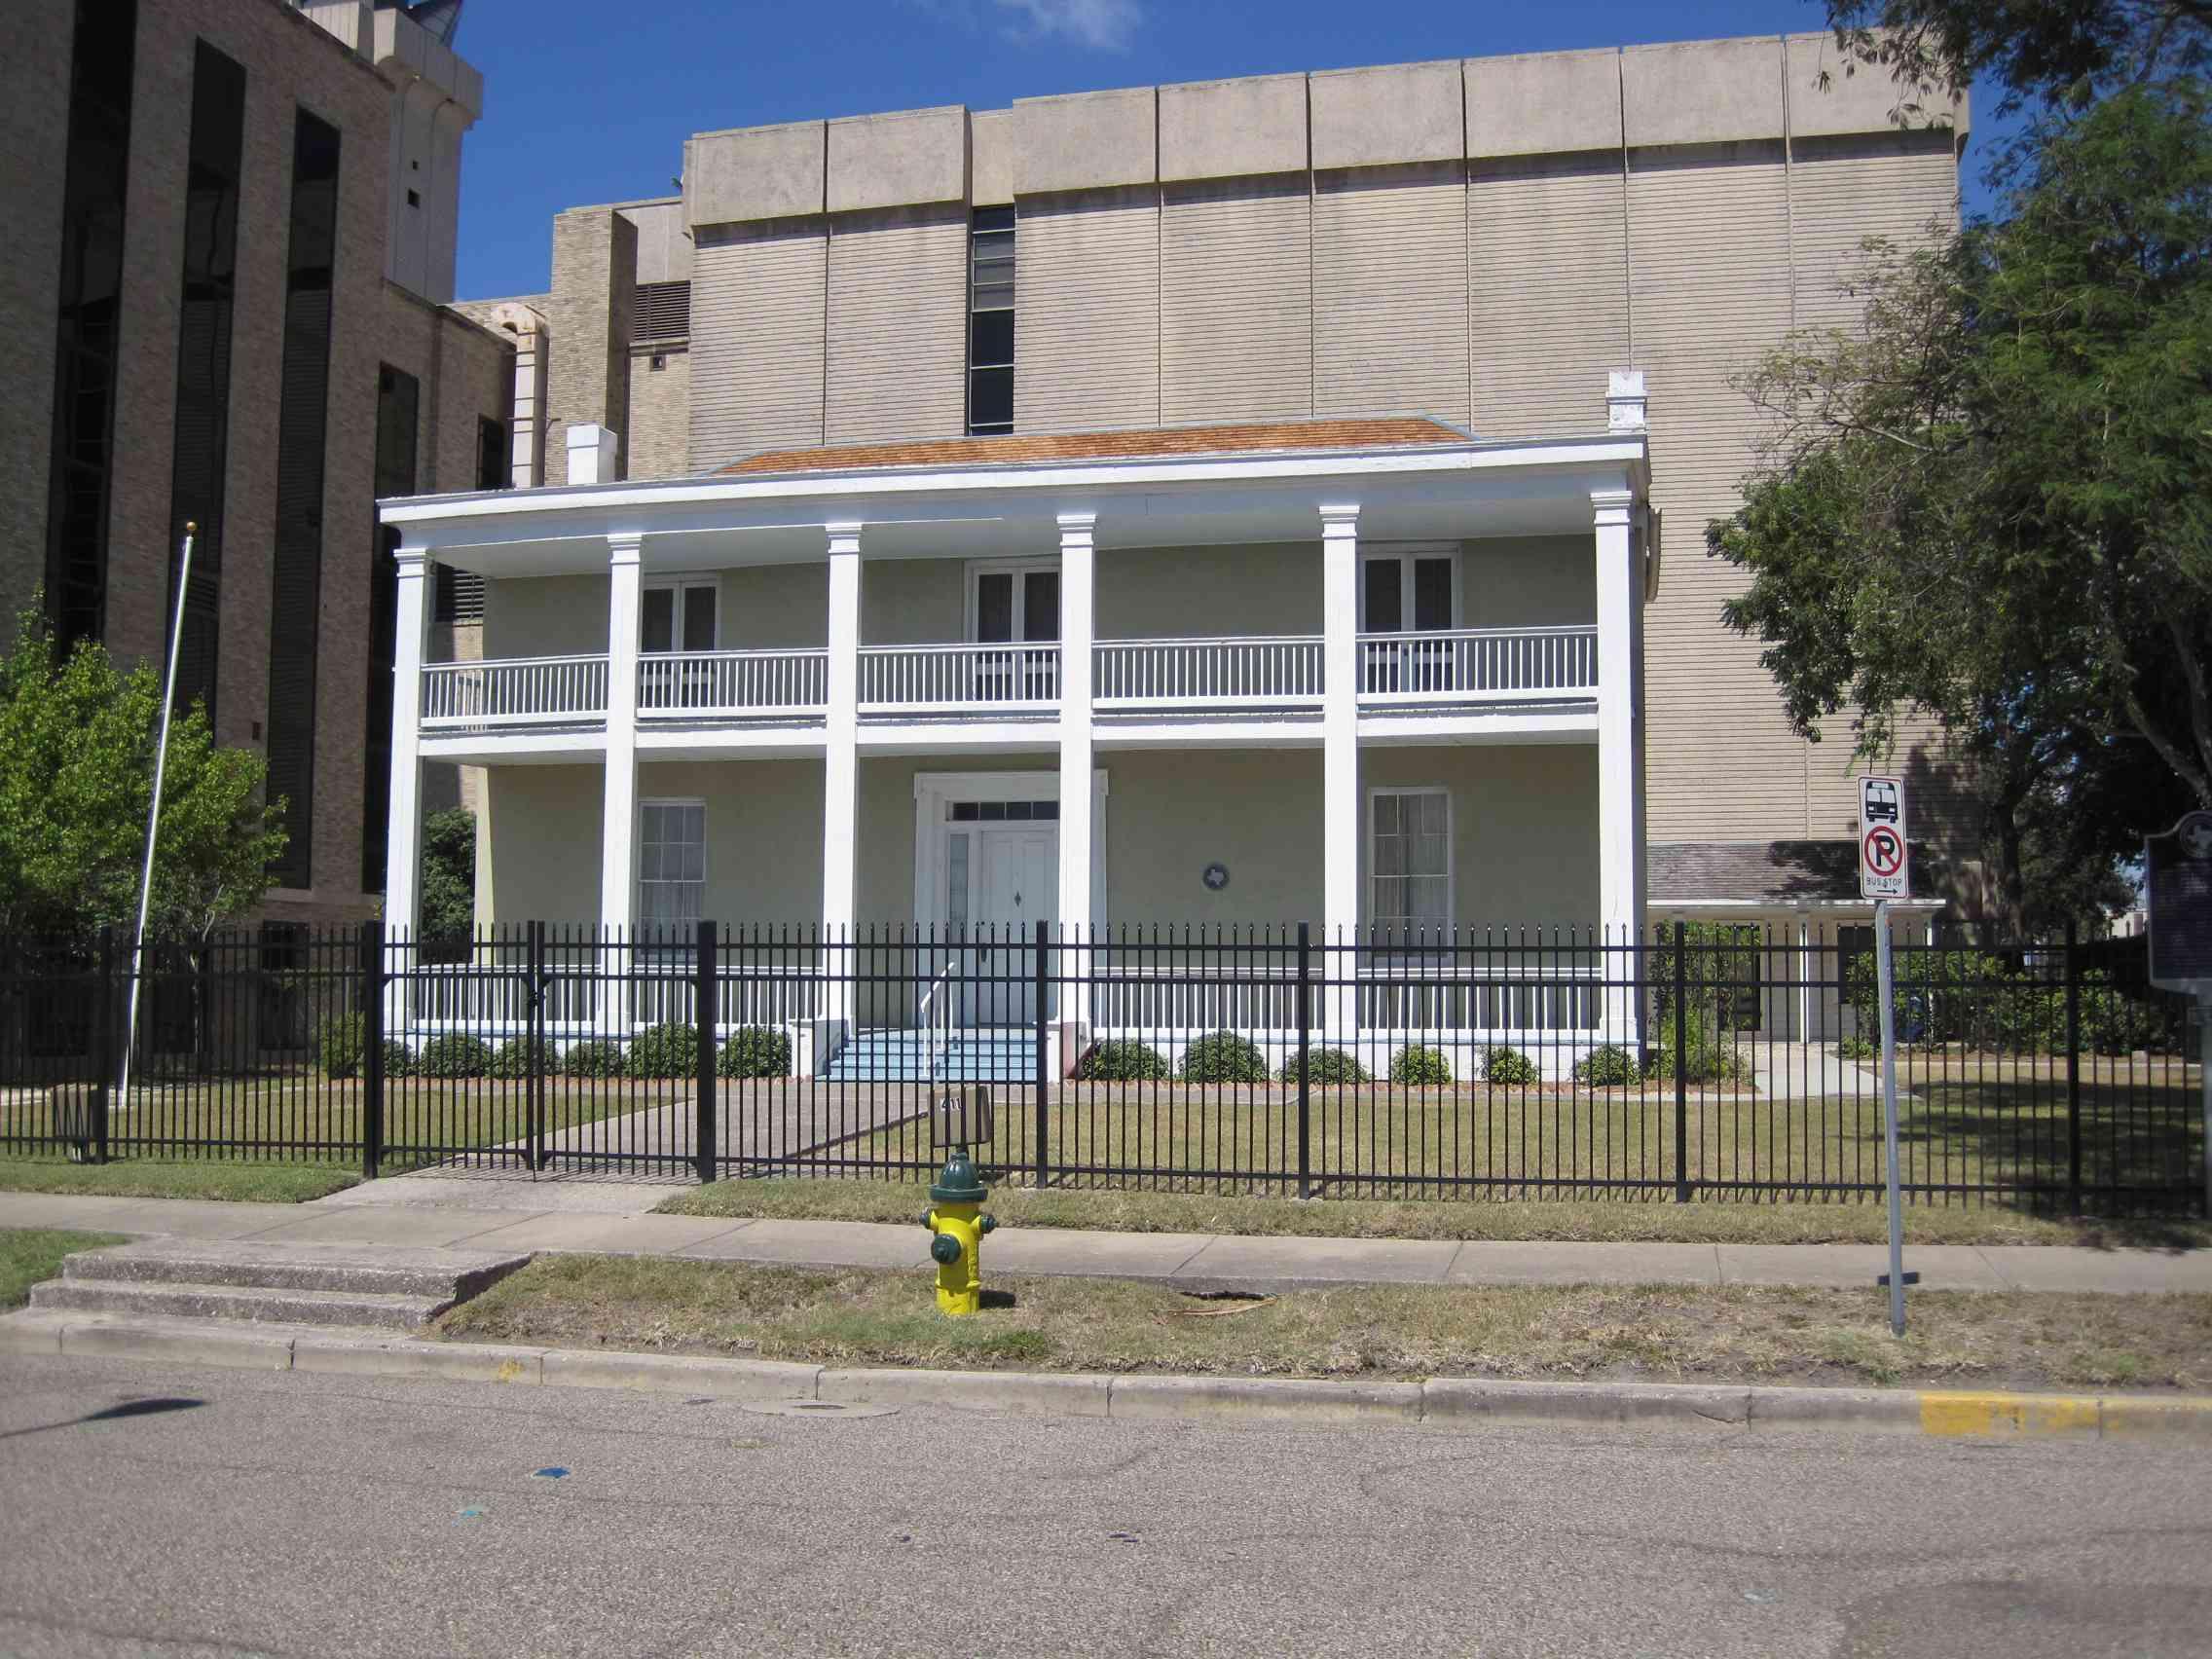 Image of Centennial House in Corpus Christi Texas